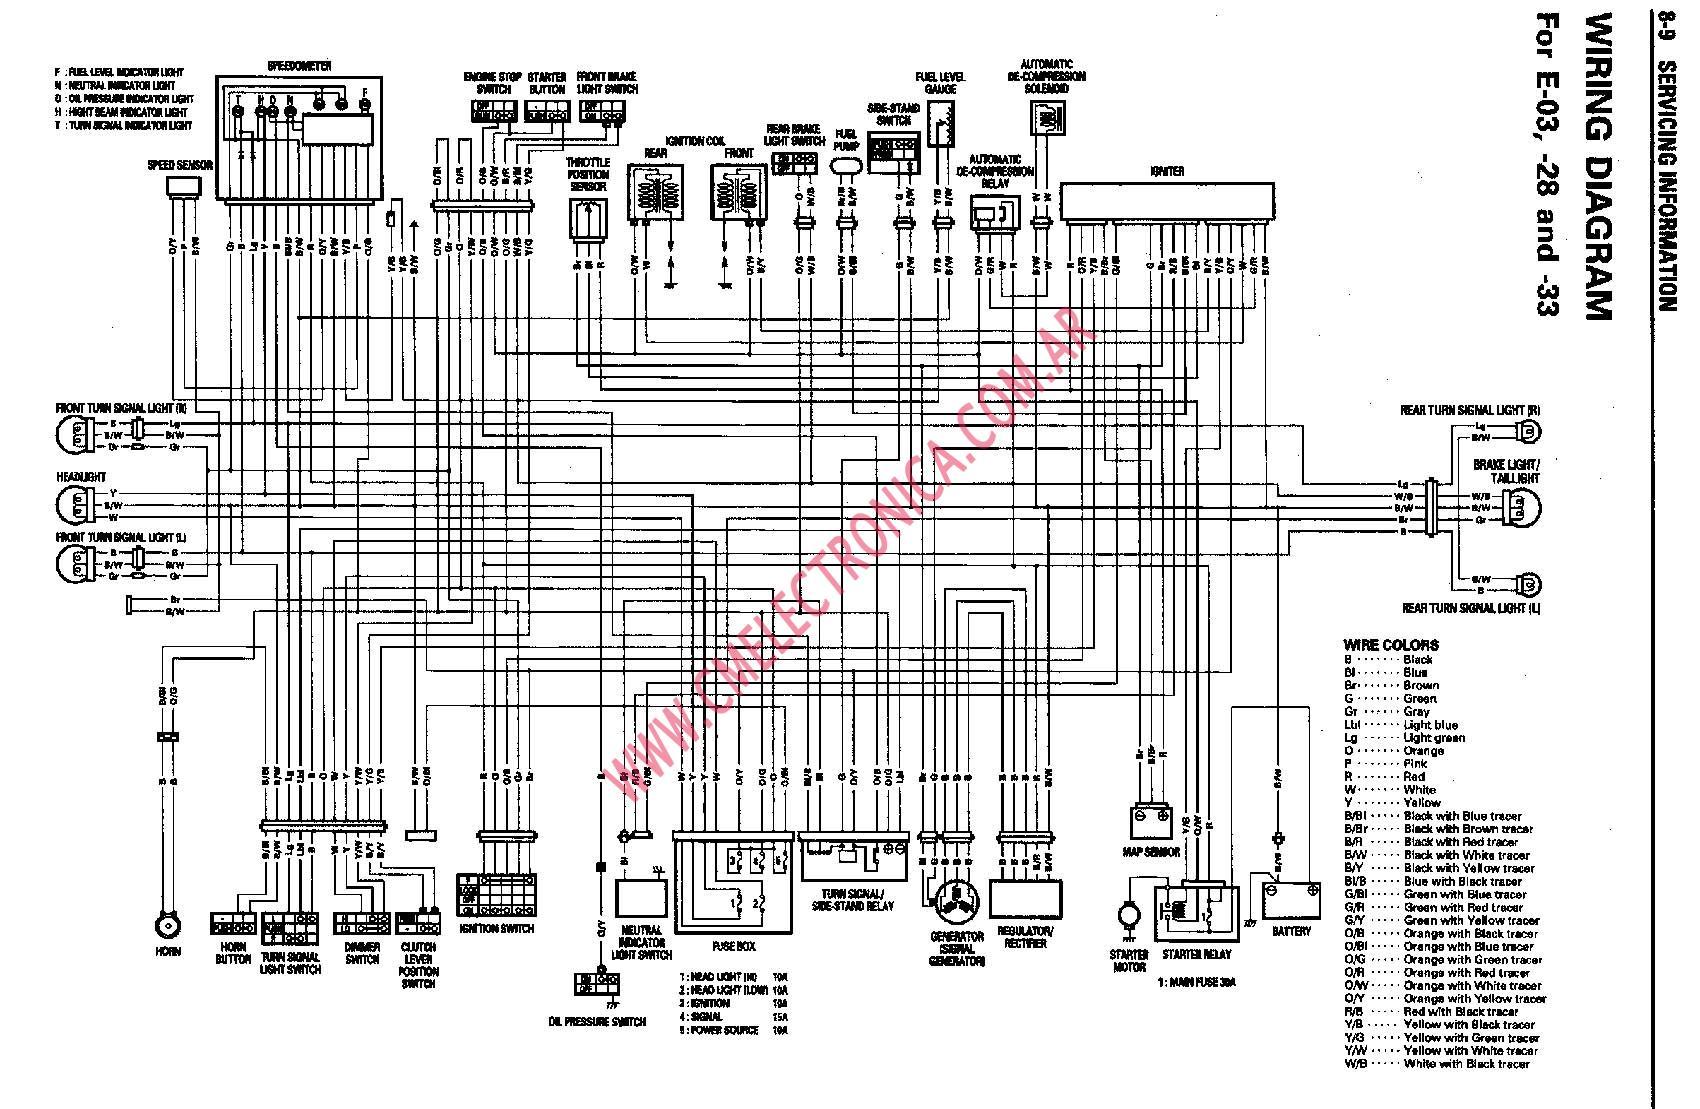 [DIAGRAM_1CA]  CG_9631] Intruder Wiring Diagram Free Download Wiring Diagram Schematic  Download Diagram | Vs 1400 Wiring Diagram |  | Feren Inki Gue45 Mohammedshrine Librar Wiring 101